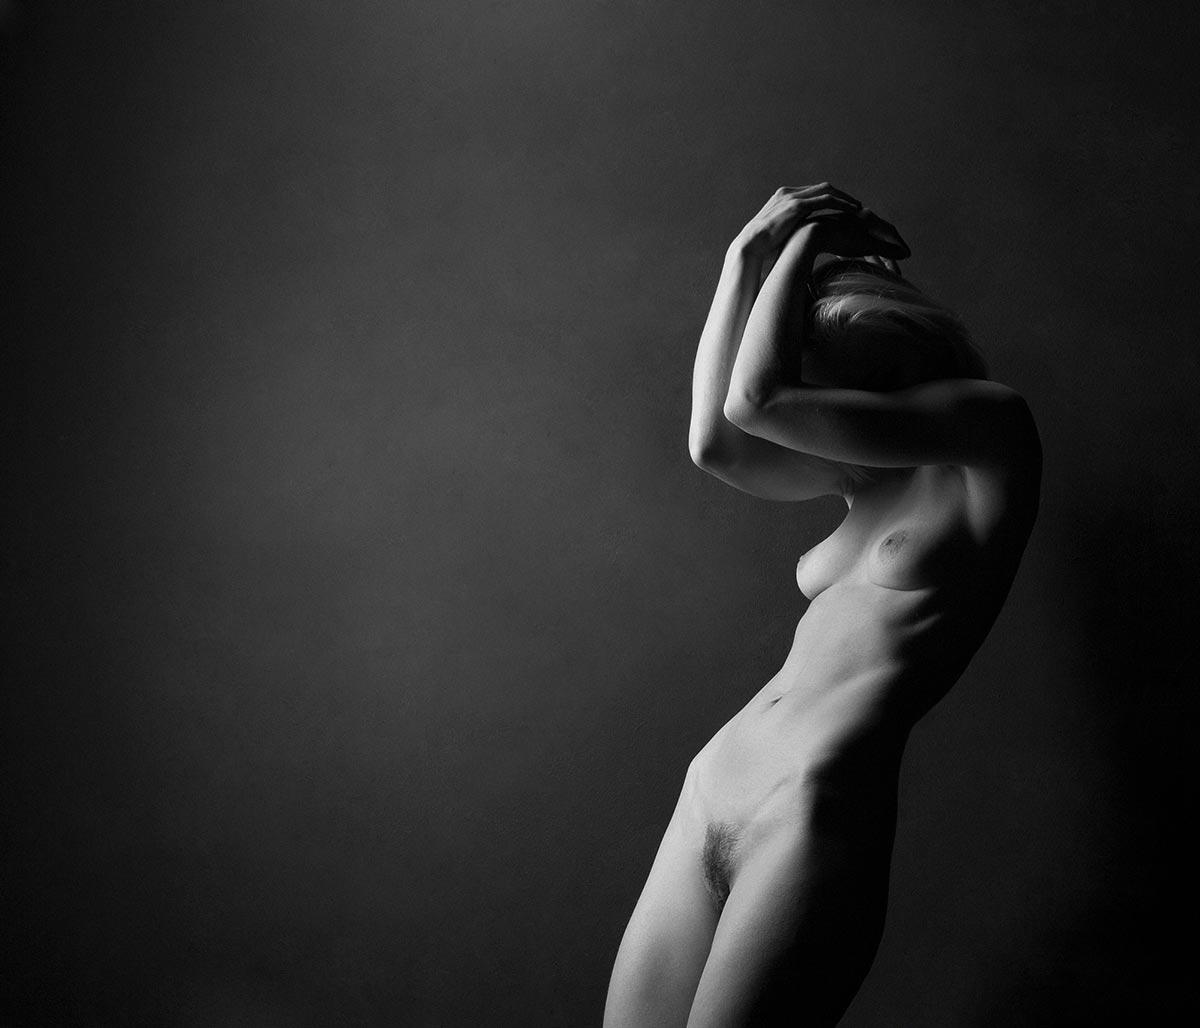 photo-nu-noiretblanc-7